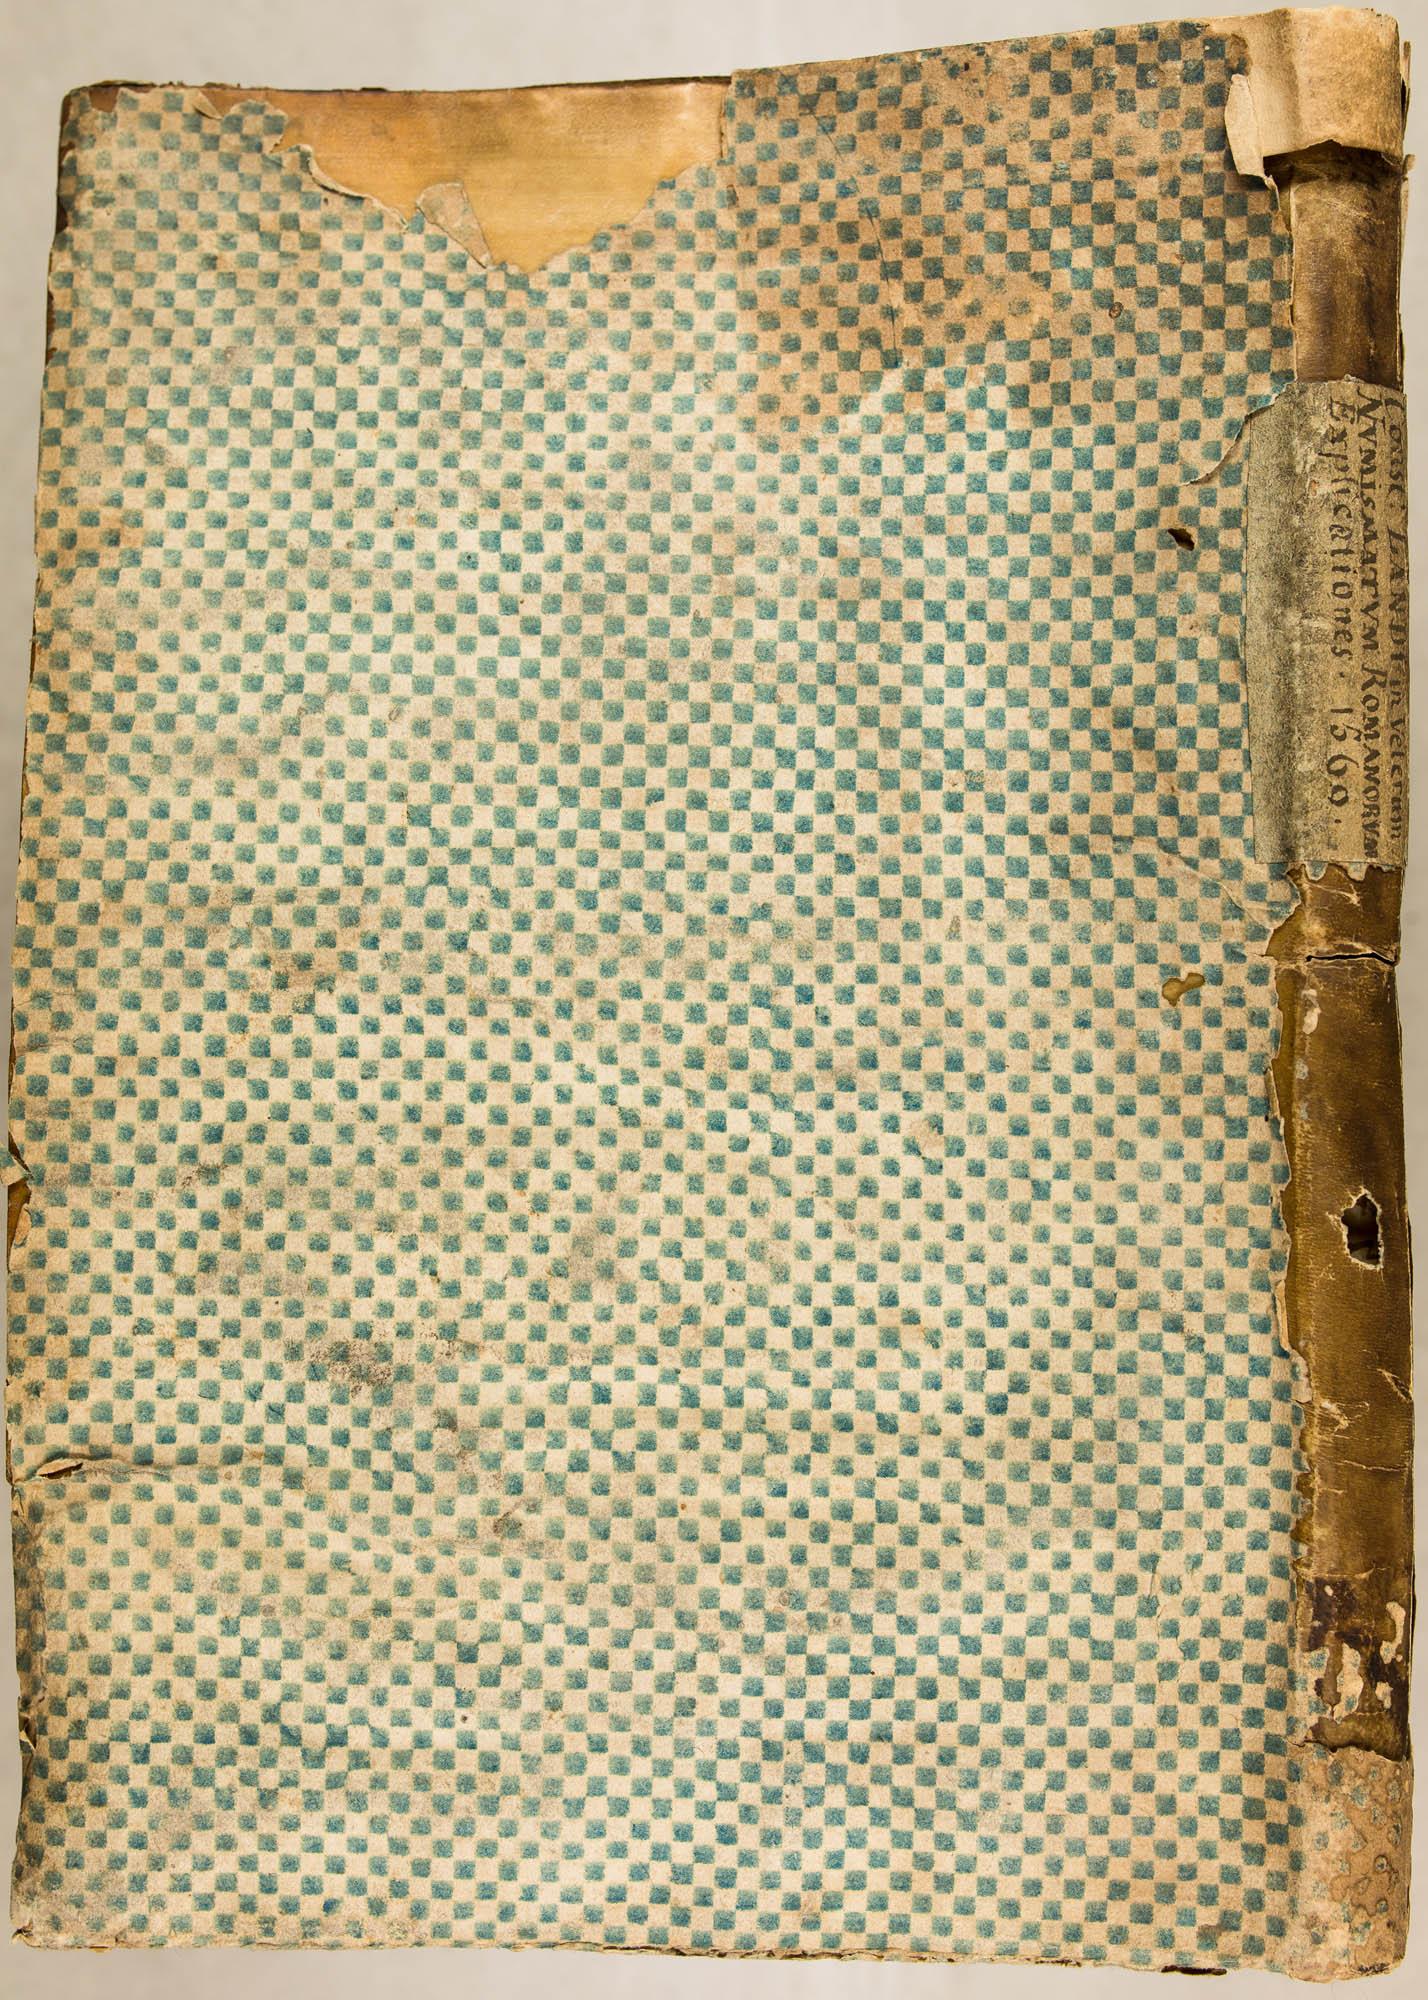 [A ORLEANS] CHEZ SEVESTRE LEBLOND N° 319. XVIIIe s.